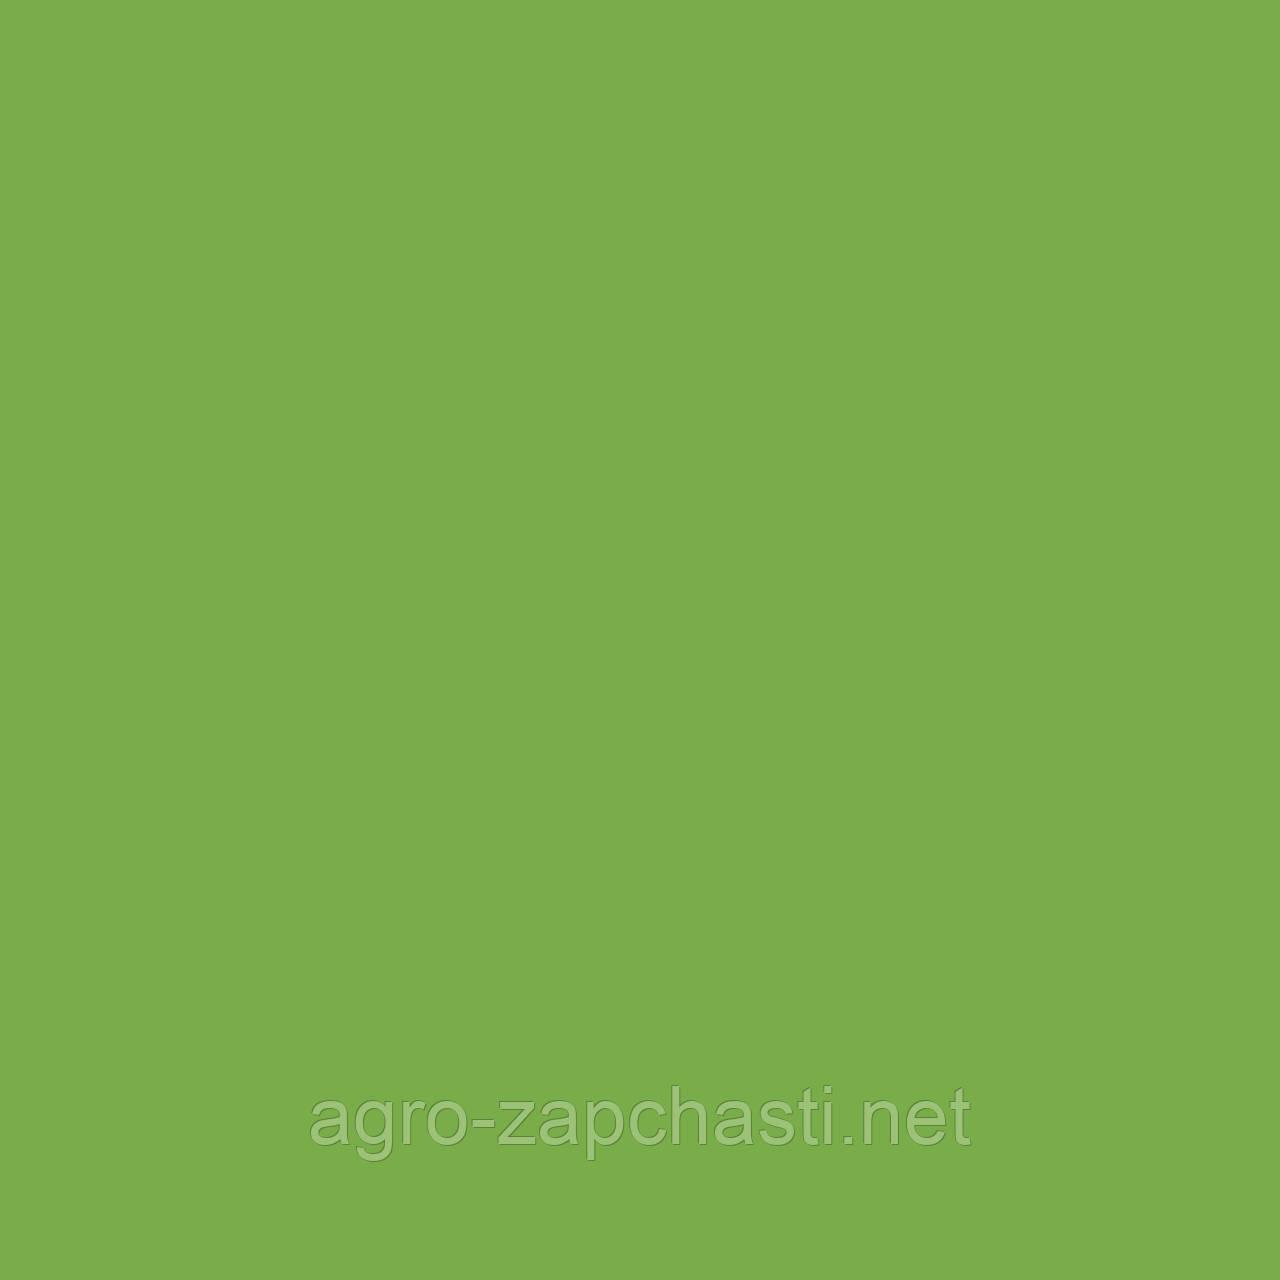 Краска Erbedol Deutz Fahr зеленая 0,75l от года 1974